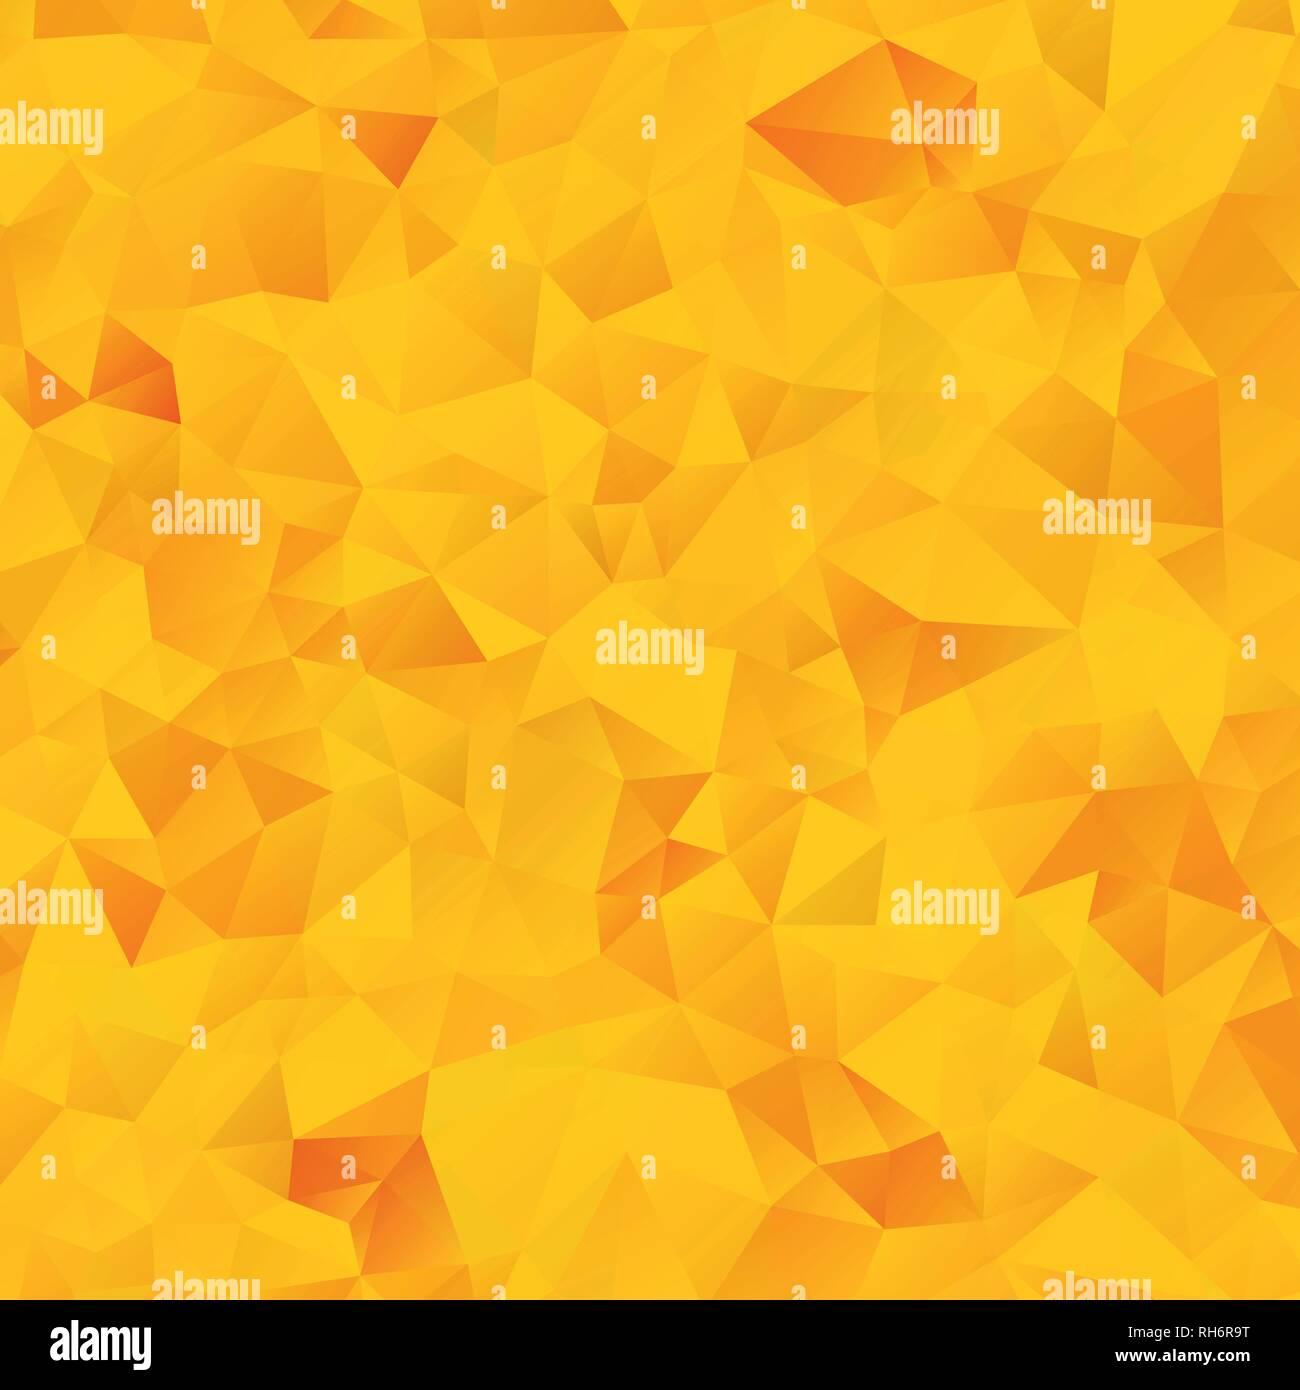 Vector Abstract Orange Yellow Geometric Gradient